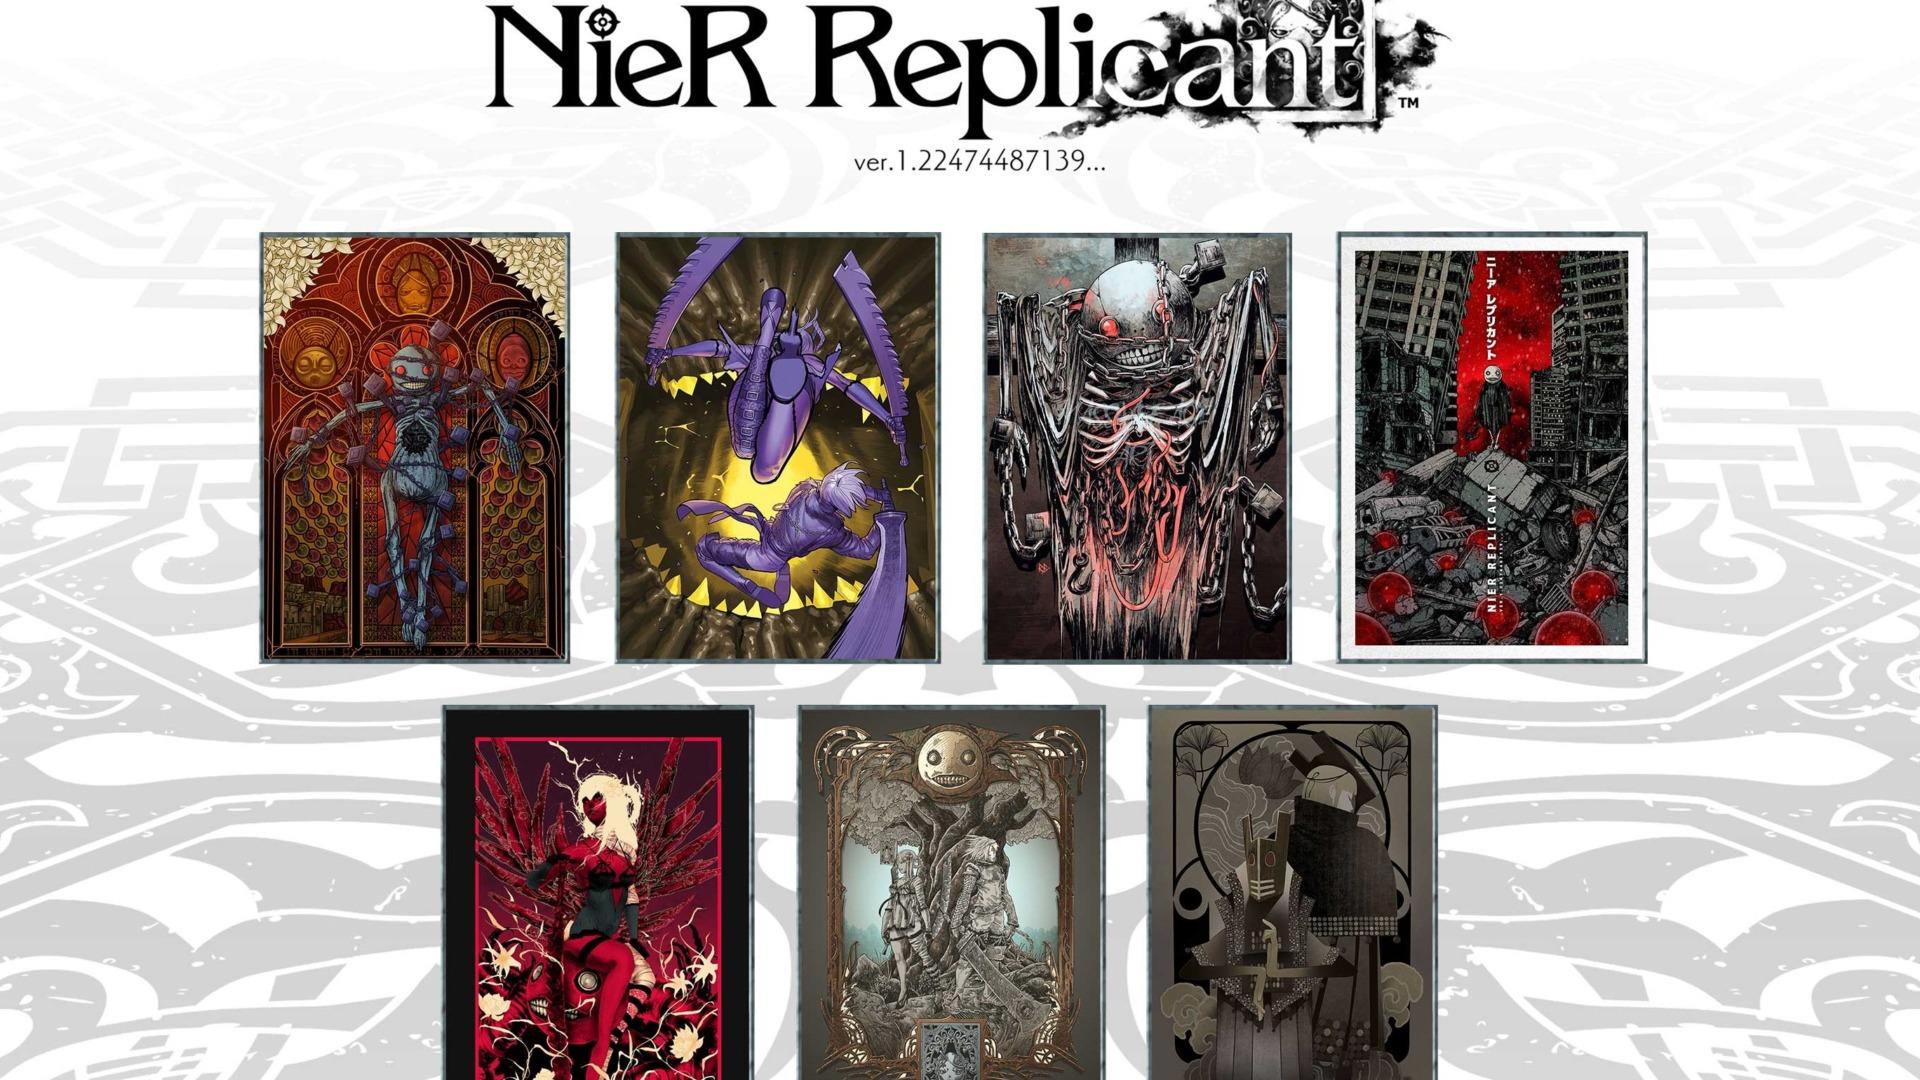 NieR 11th anniversary art nier replicant